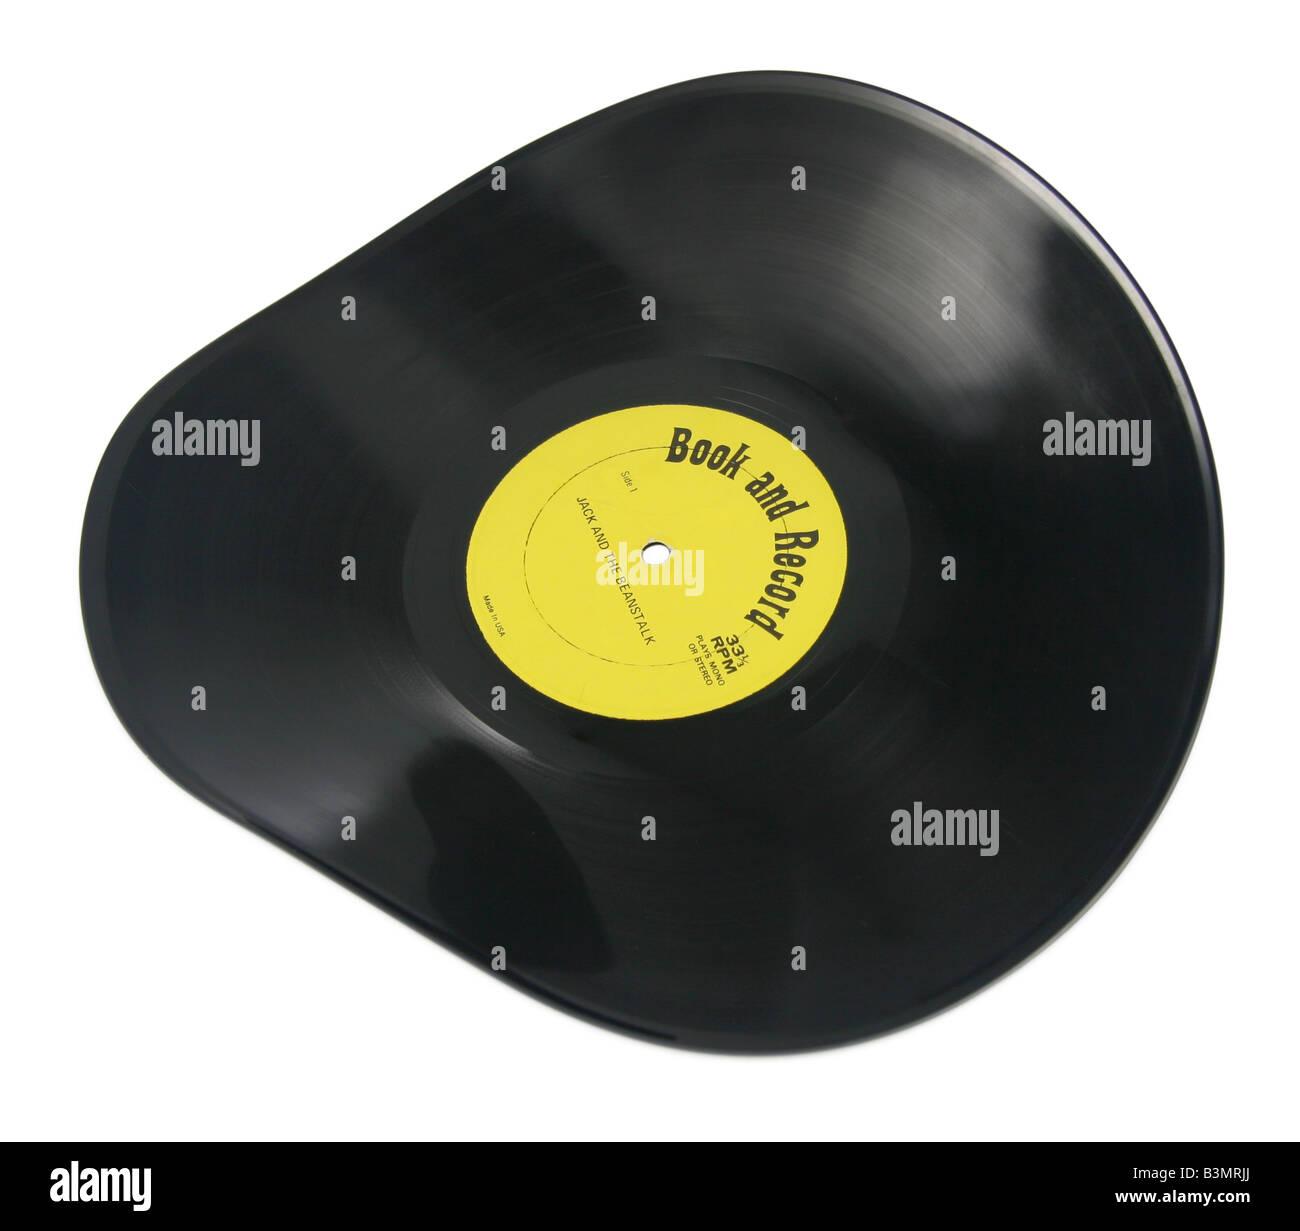 Warped record. - Stock Image